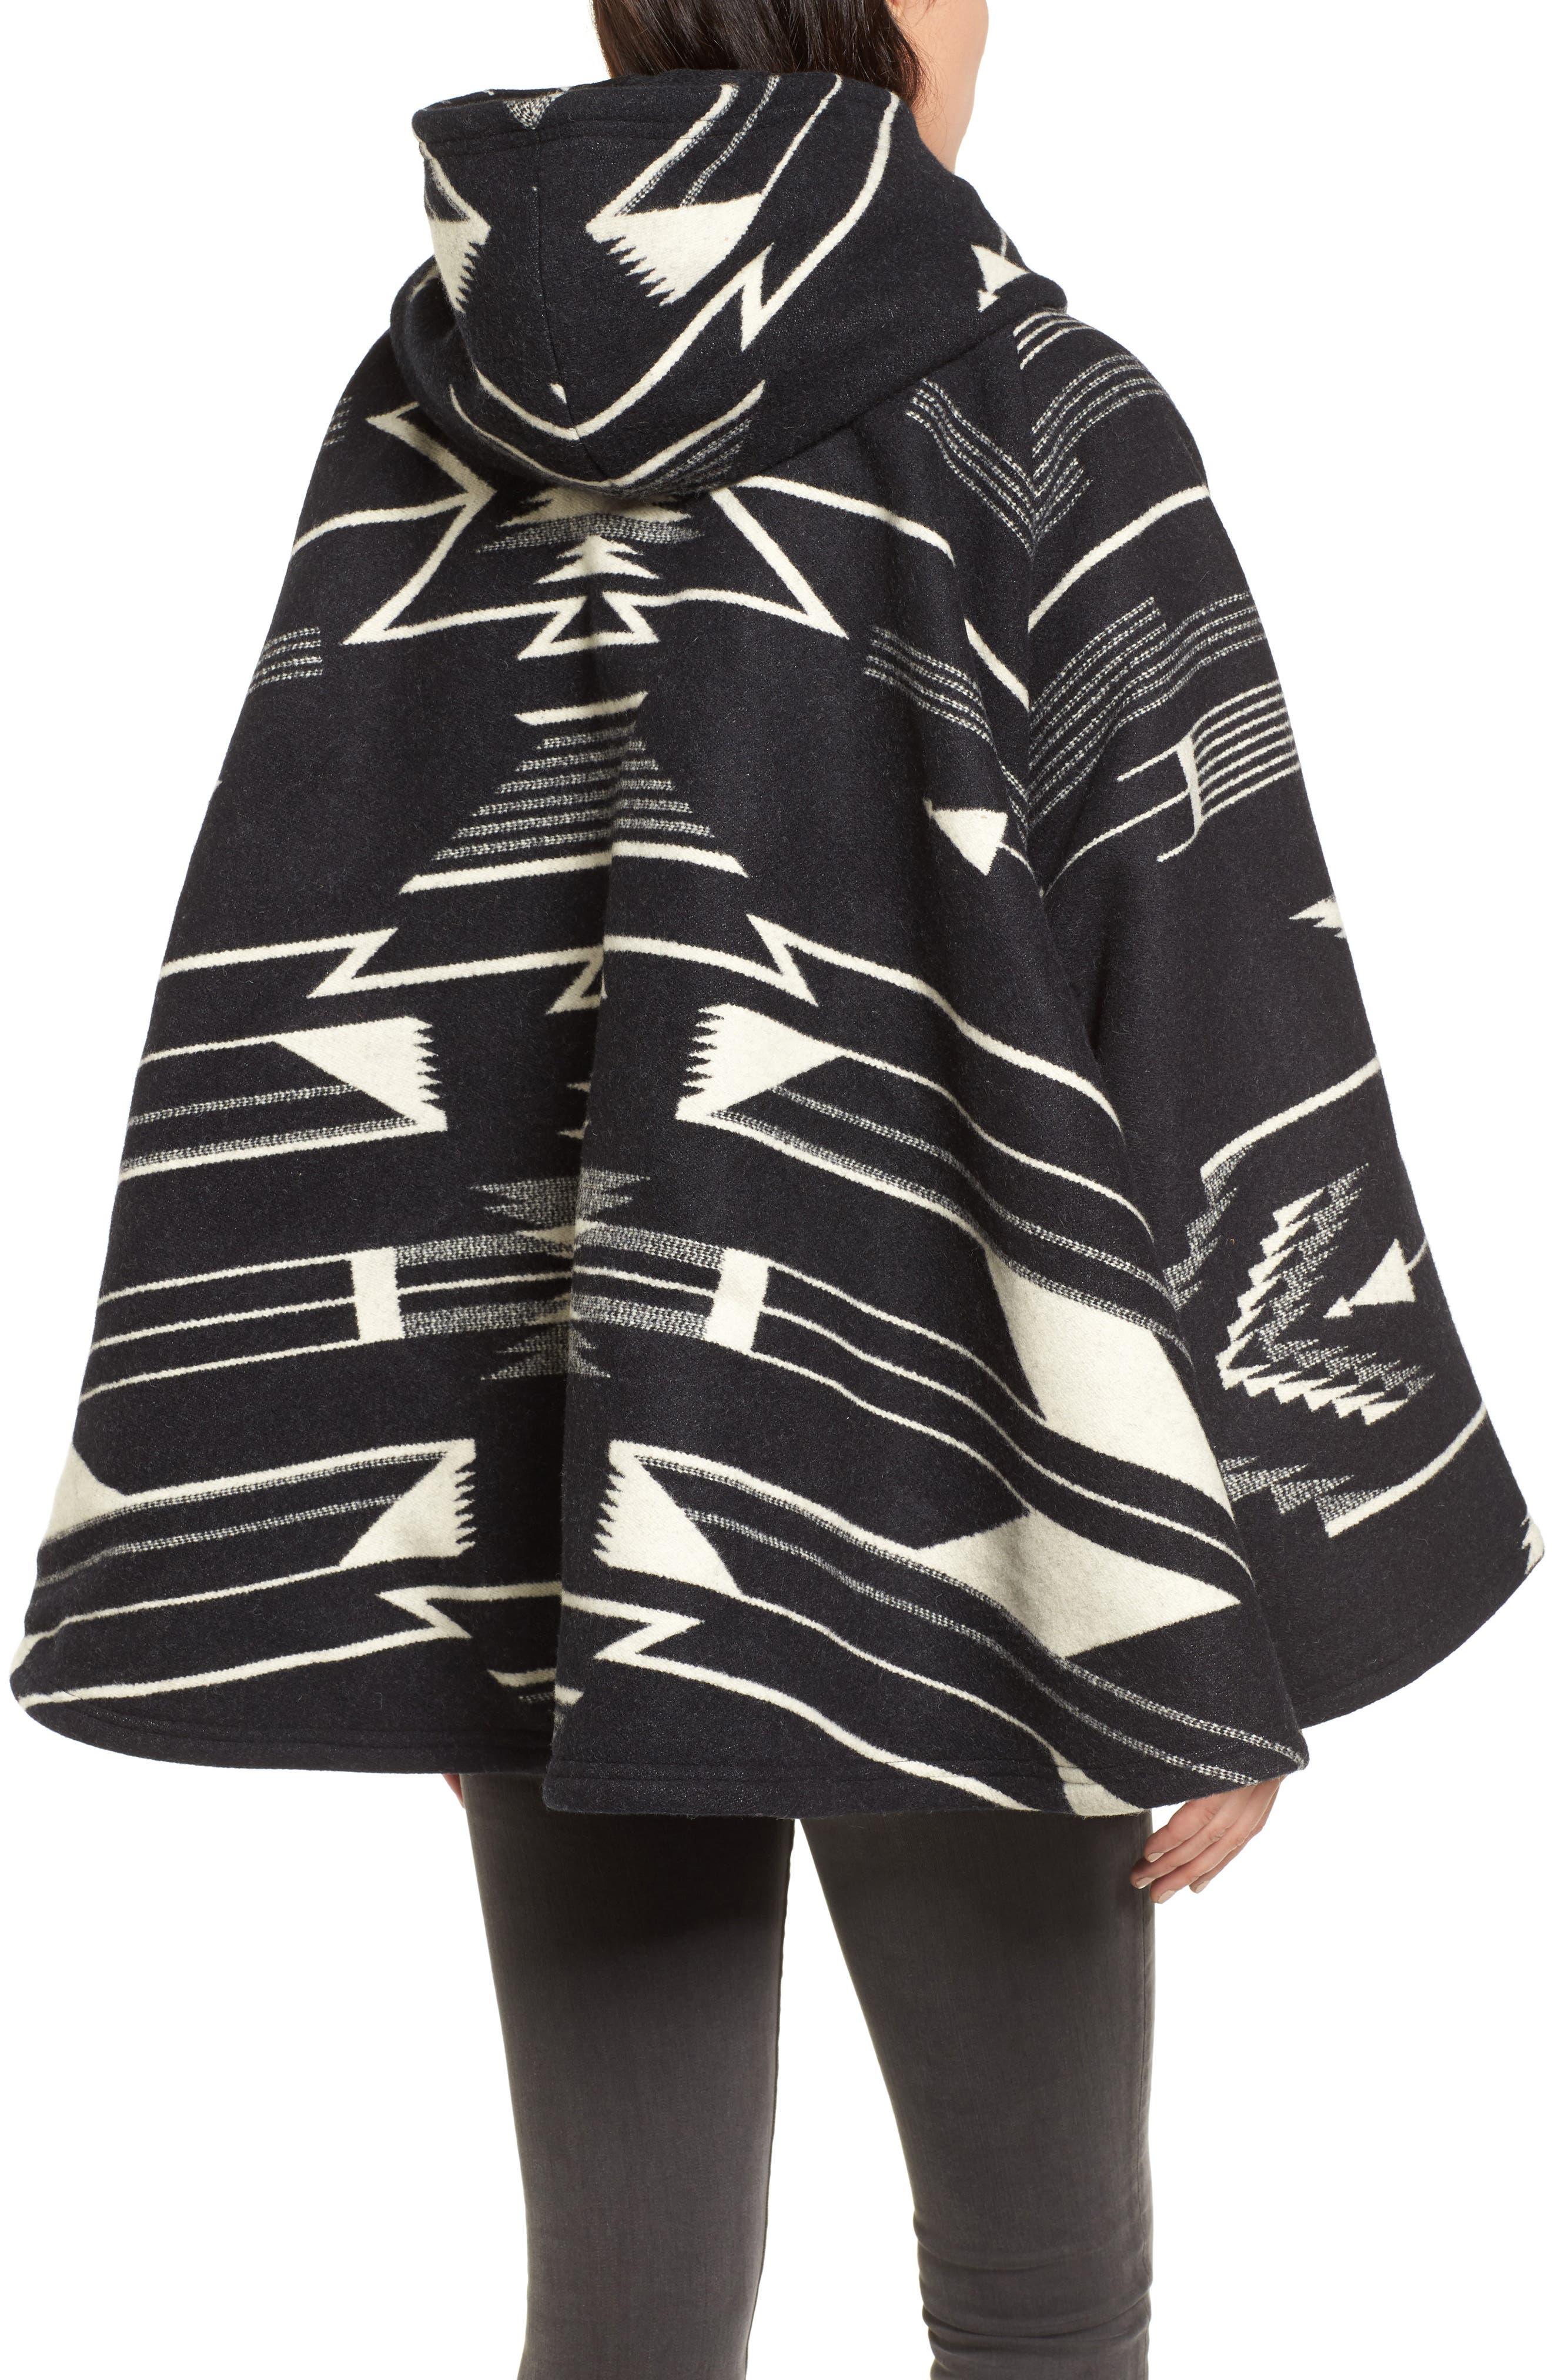 LINDSEY THORNBURG,                             x Pendleton Wool Blend Hooded Cape,                             Alternate thumbnail 2, color,                             005